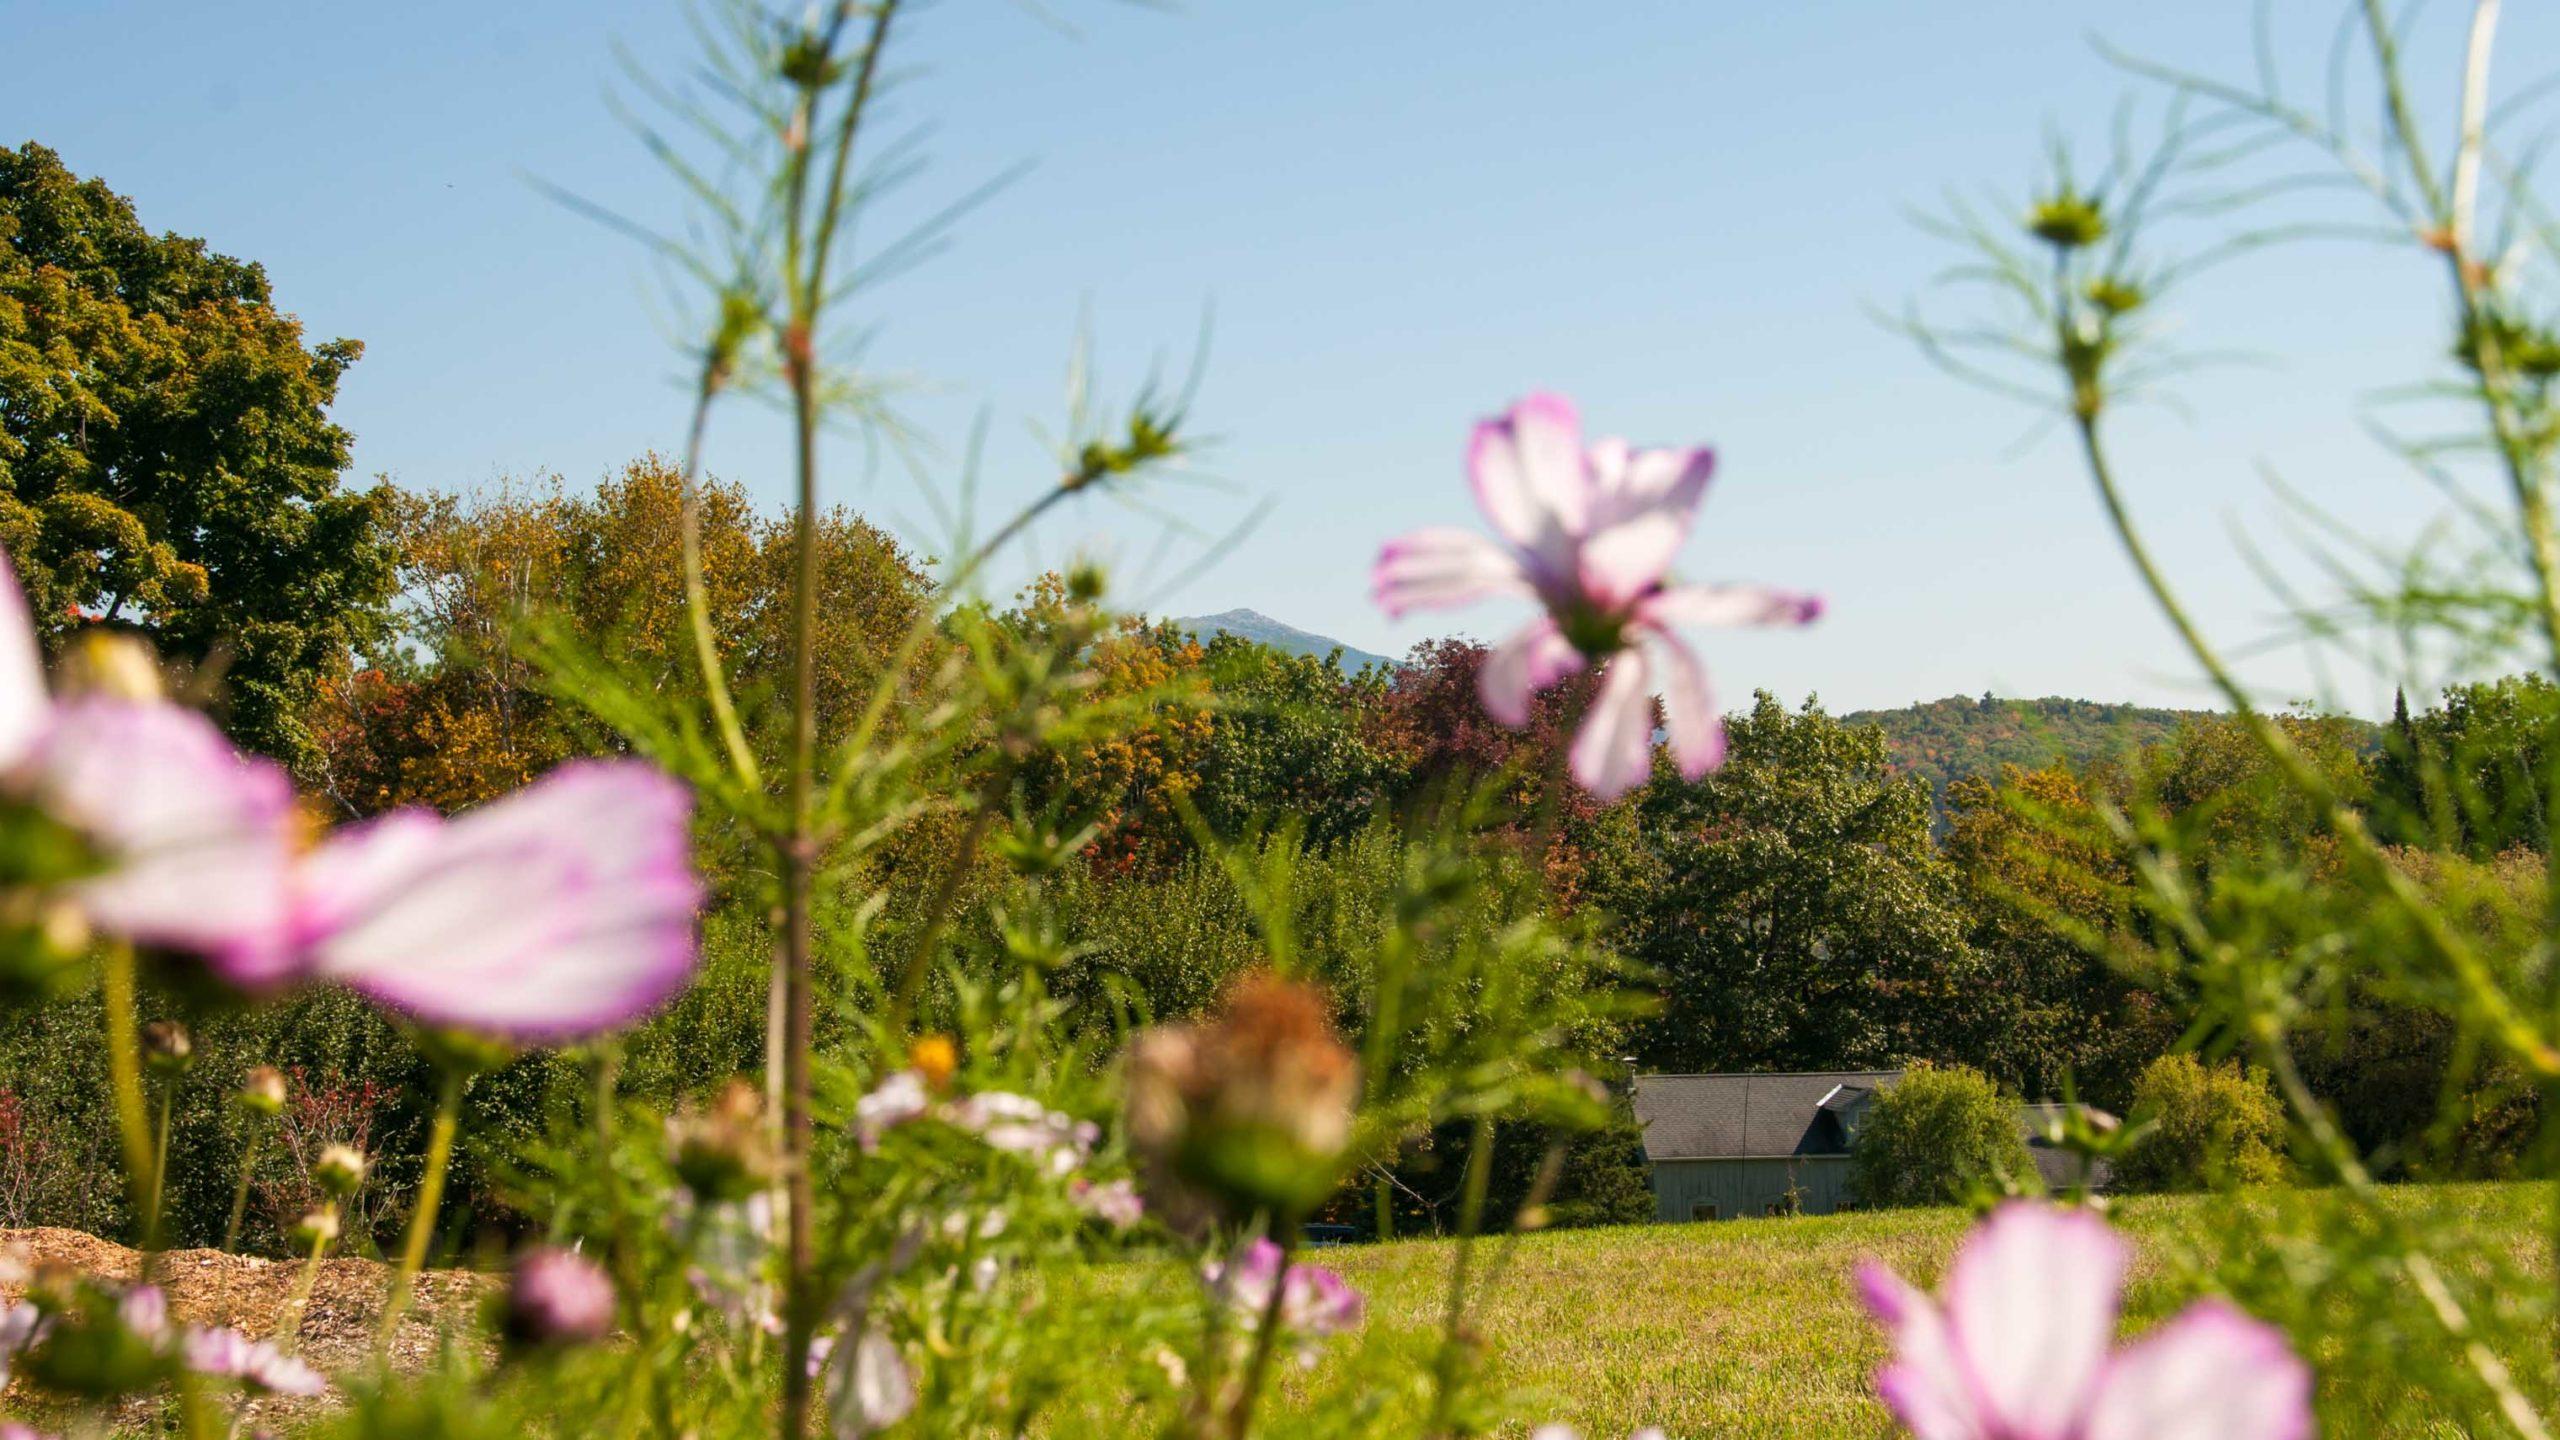 Pink flowers in the camp glen brook field.